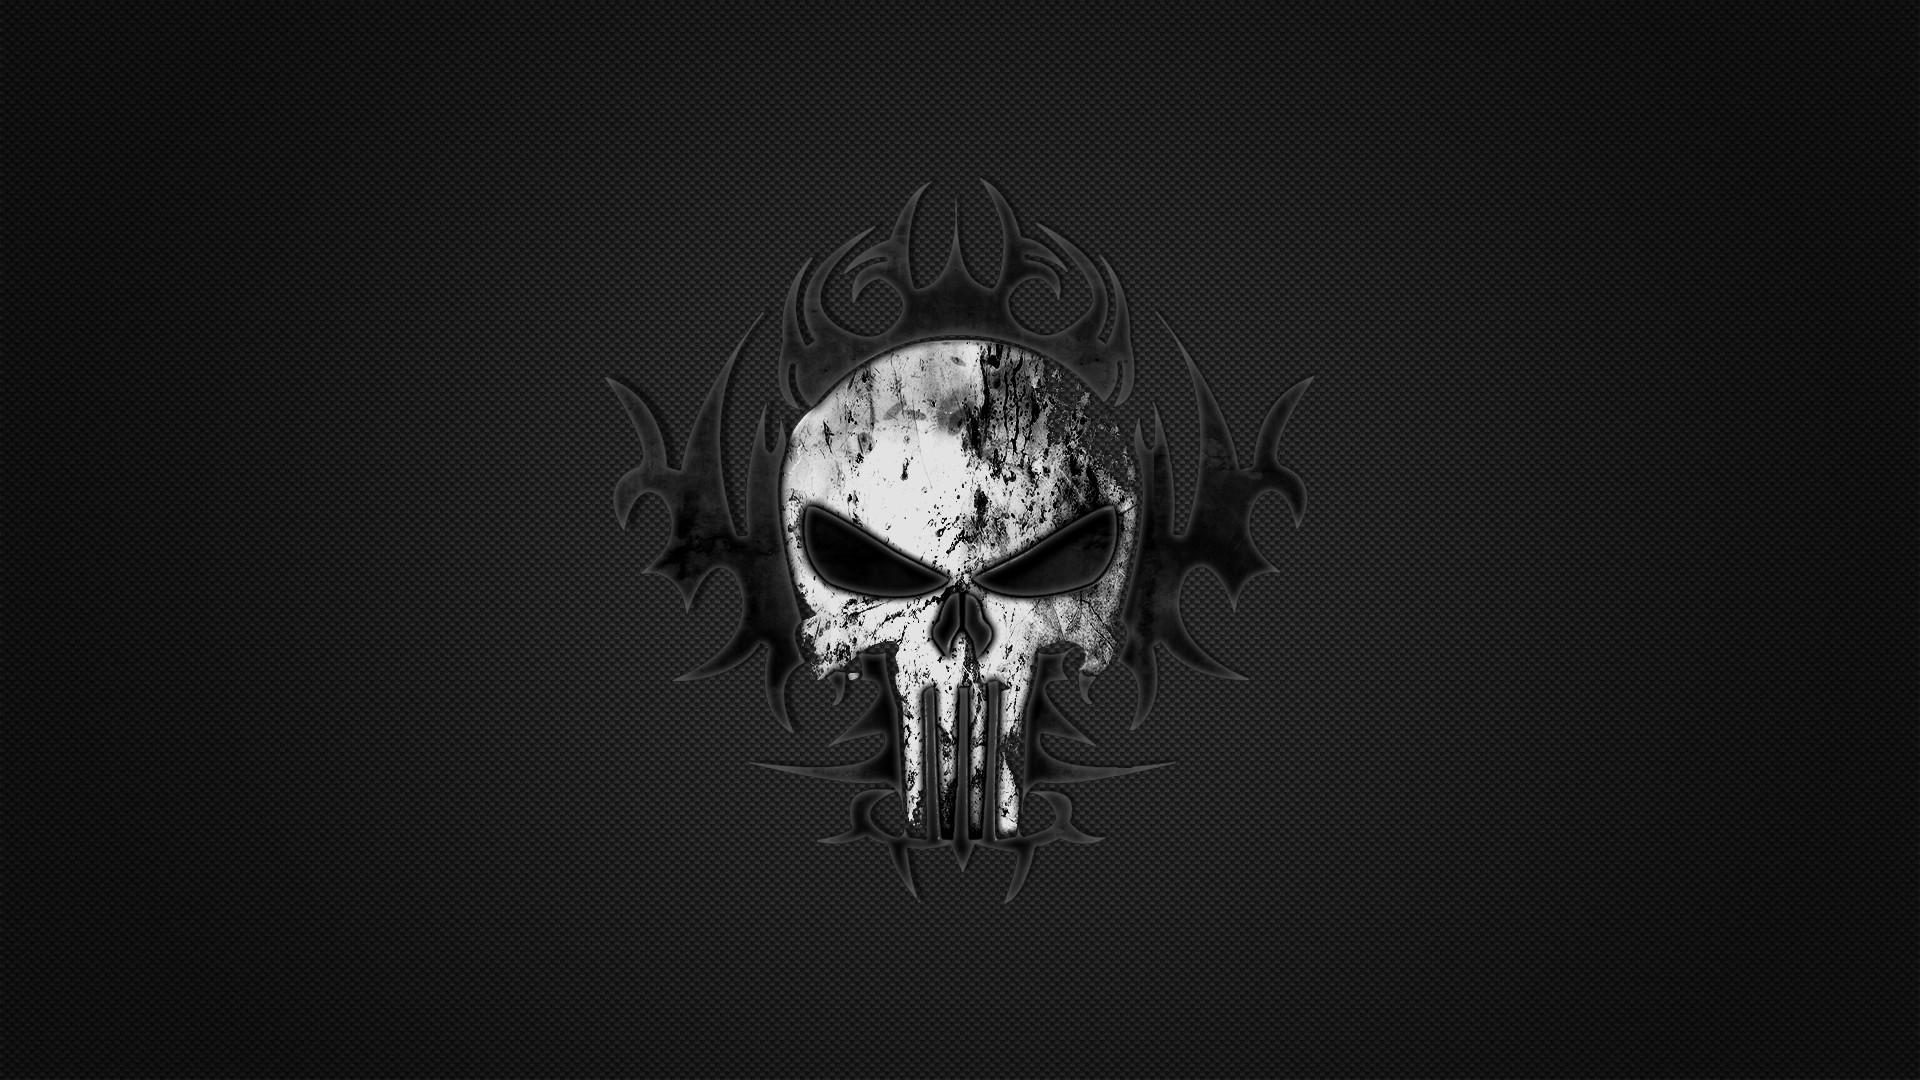 Res: 1920x1080, Punisher Images For Desktop Wallpaper 1920 x 1080 px 623.08 KB max skull  logo widescreen desktop